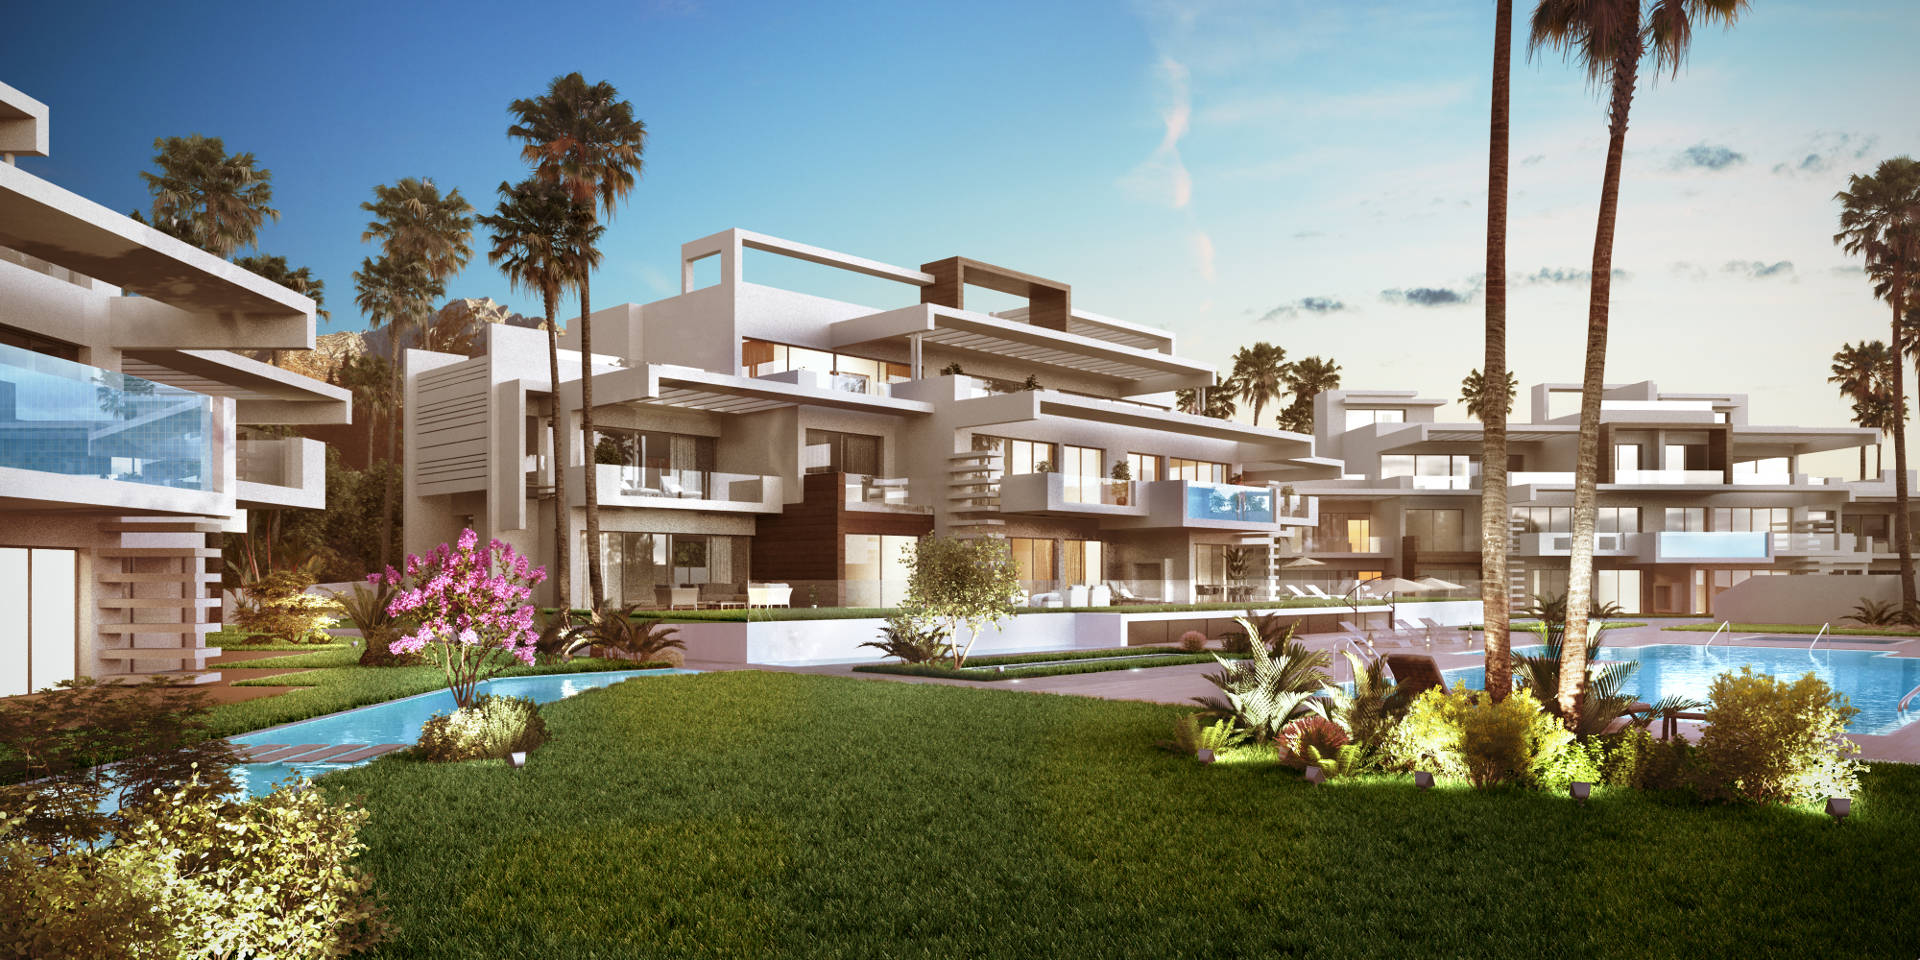 Two bedroom apartment for sale Marbella new build La Meridiana Suites